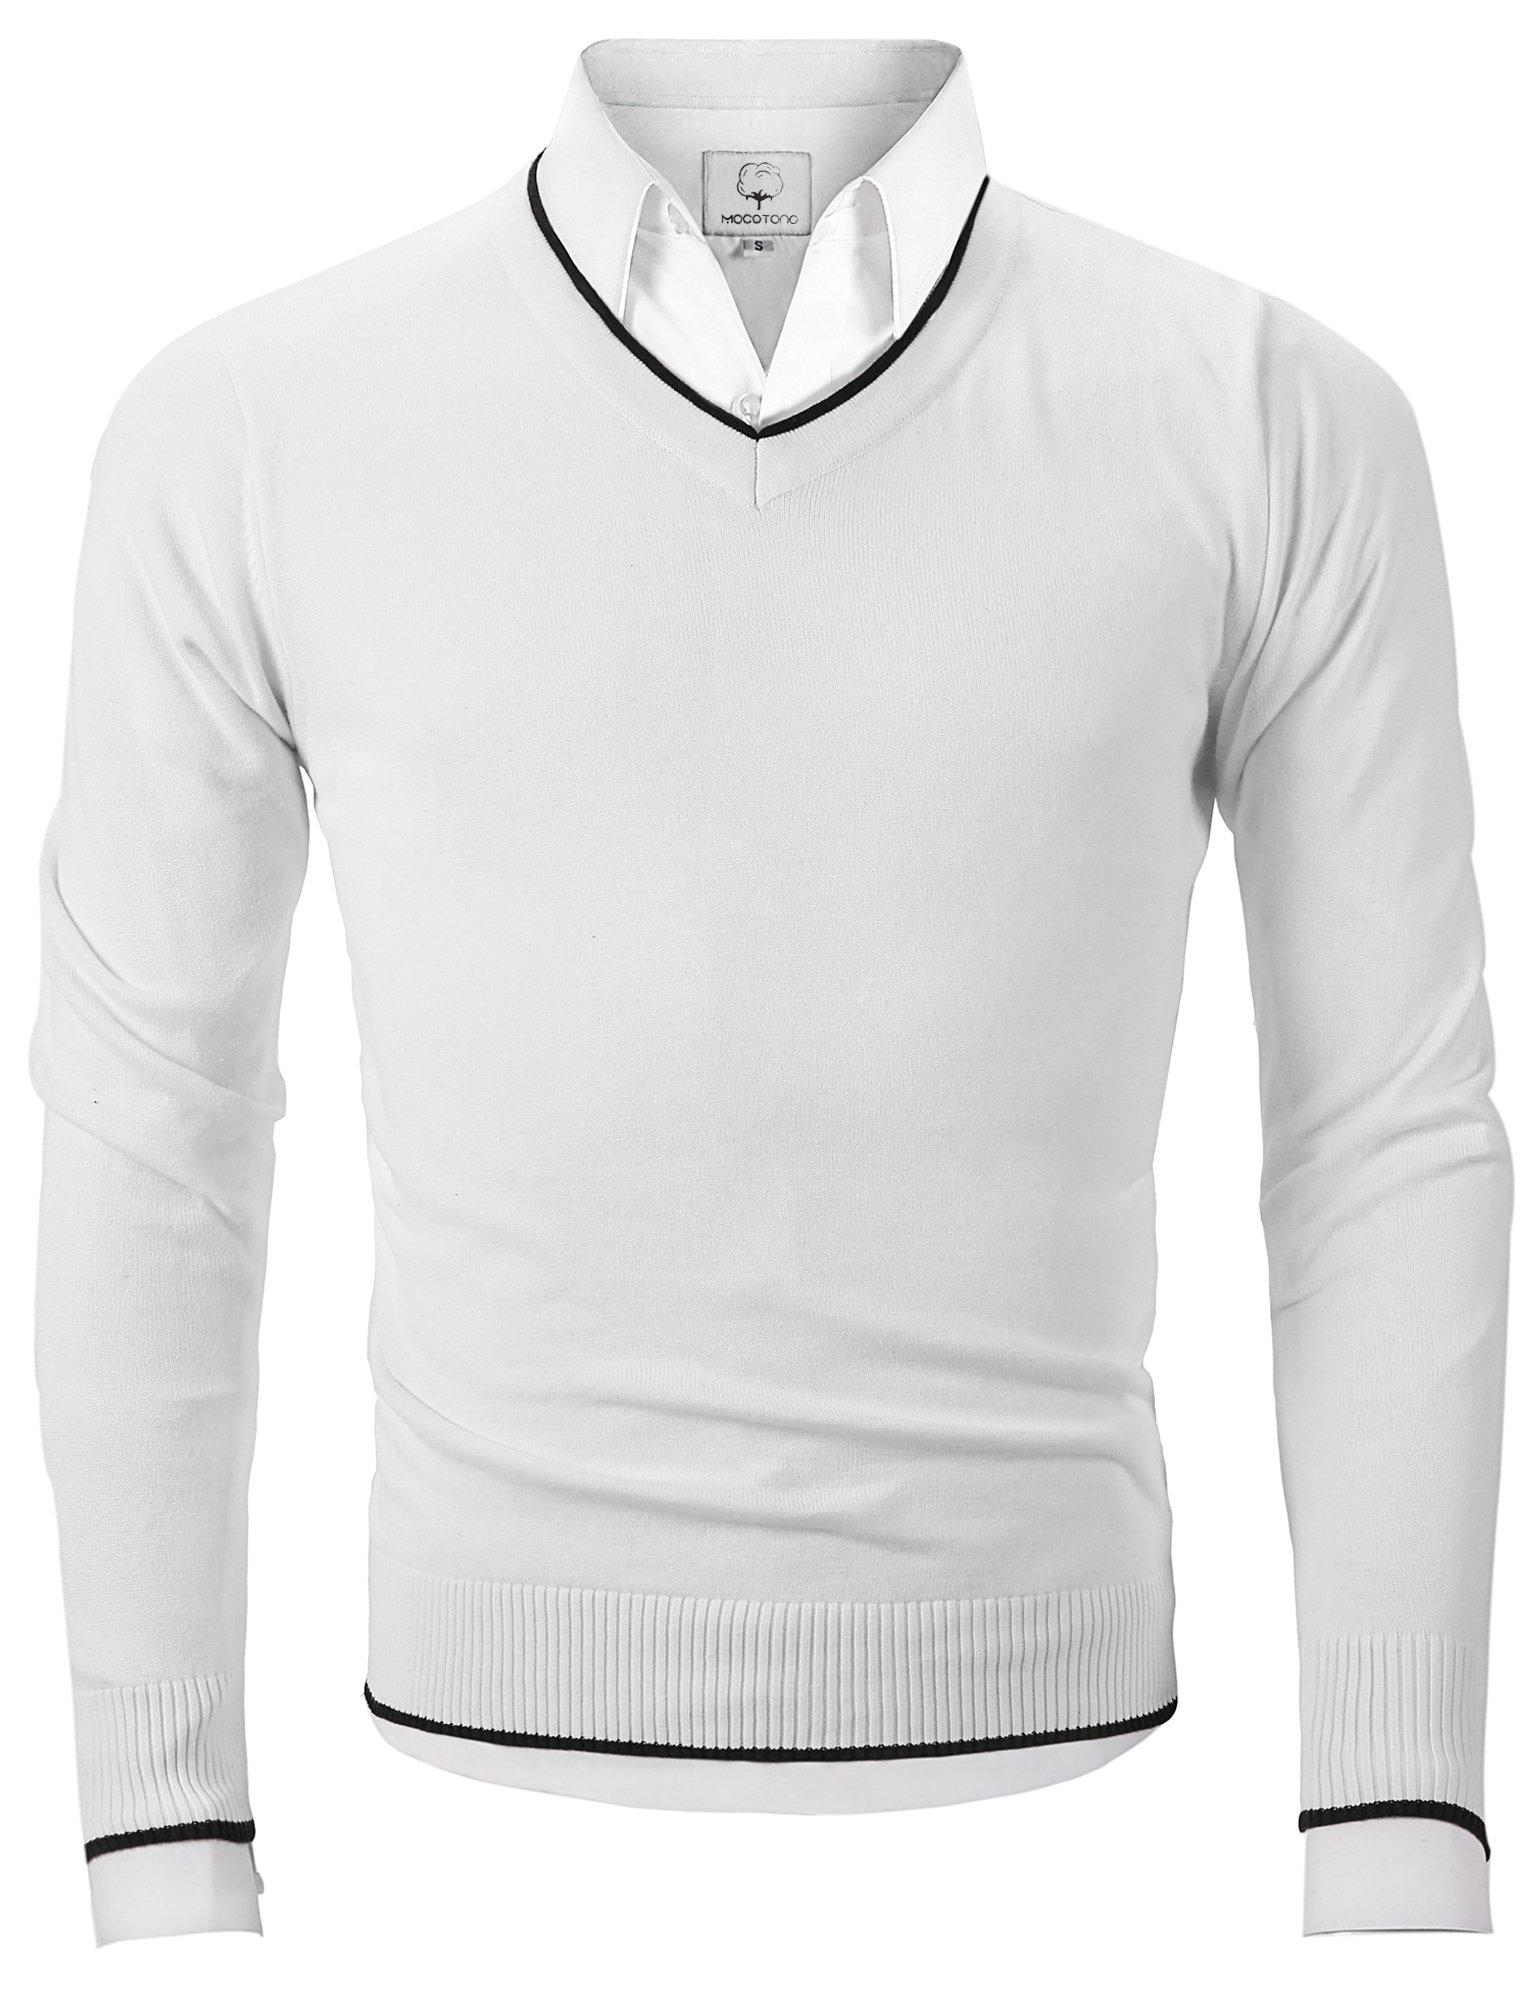 MOCOTONO Men's V Neck Pullover Sweater Long Sleeve Cotton Casual Sweat Dress,White,Small